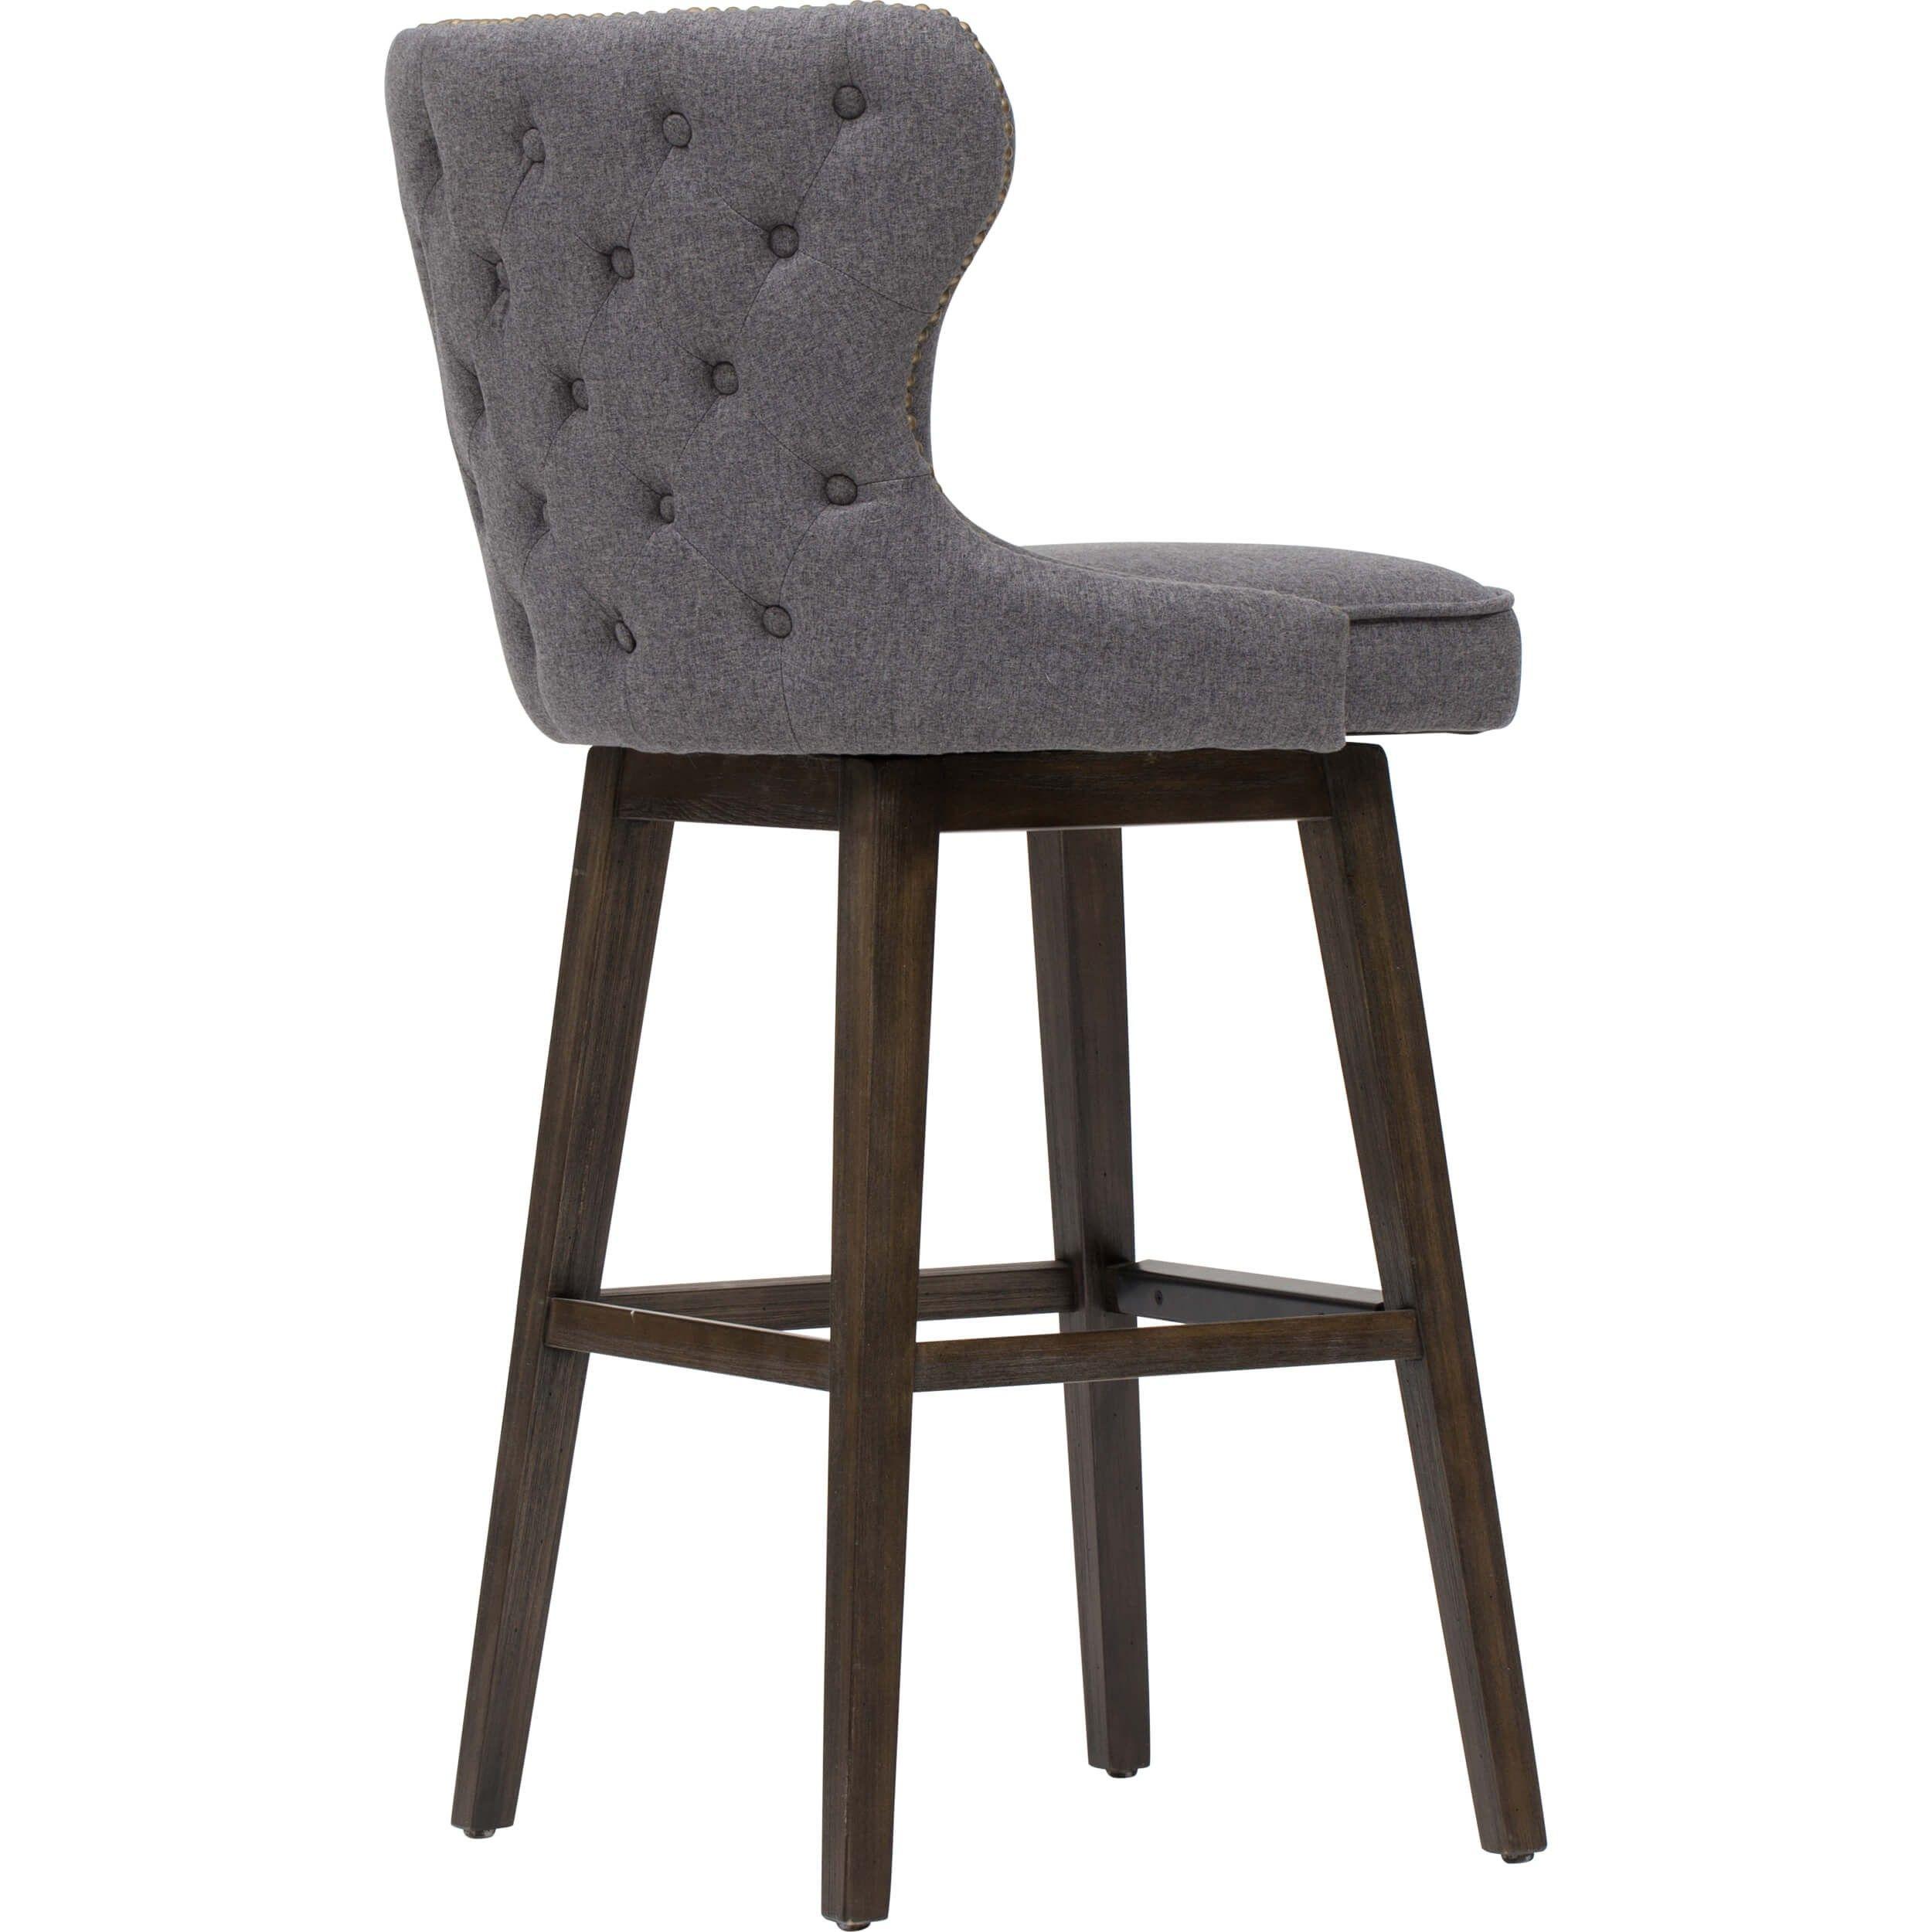 Ariana Swivel Bar Stool, Dark Grey | Basement | Pinterest | Bar Within Katrina Beige Swivel Glider Chairs (View 17 of 25)